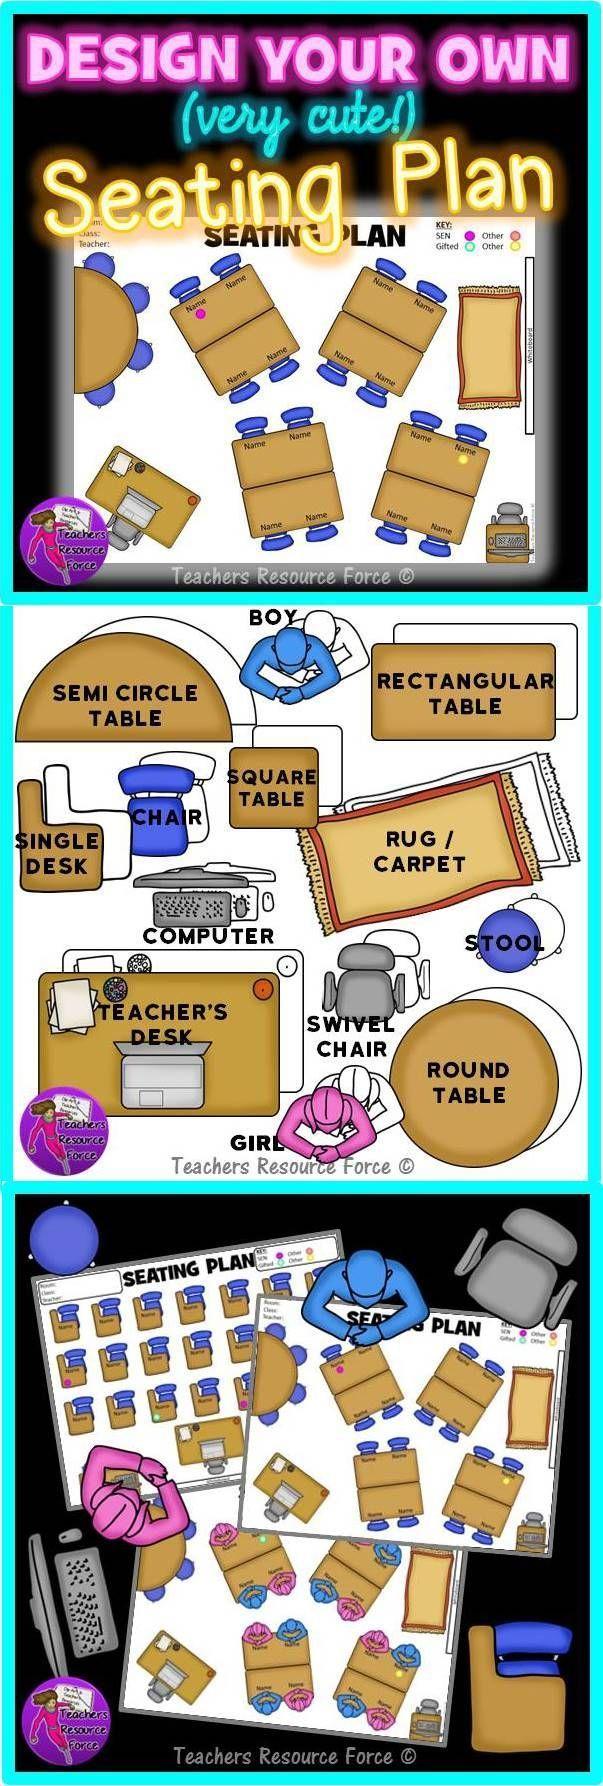 Classroom Design Chart ~ Best ideas about seating chart classroom on pinterest